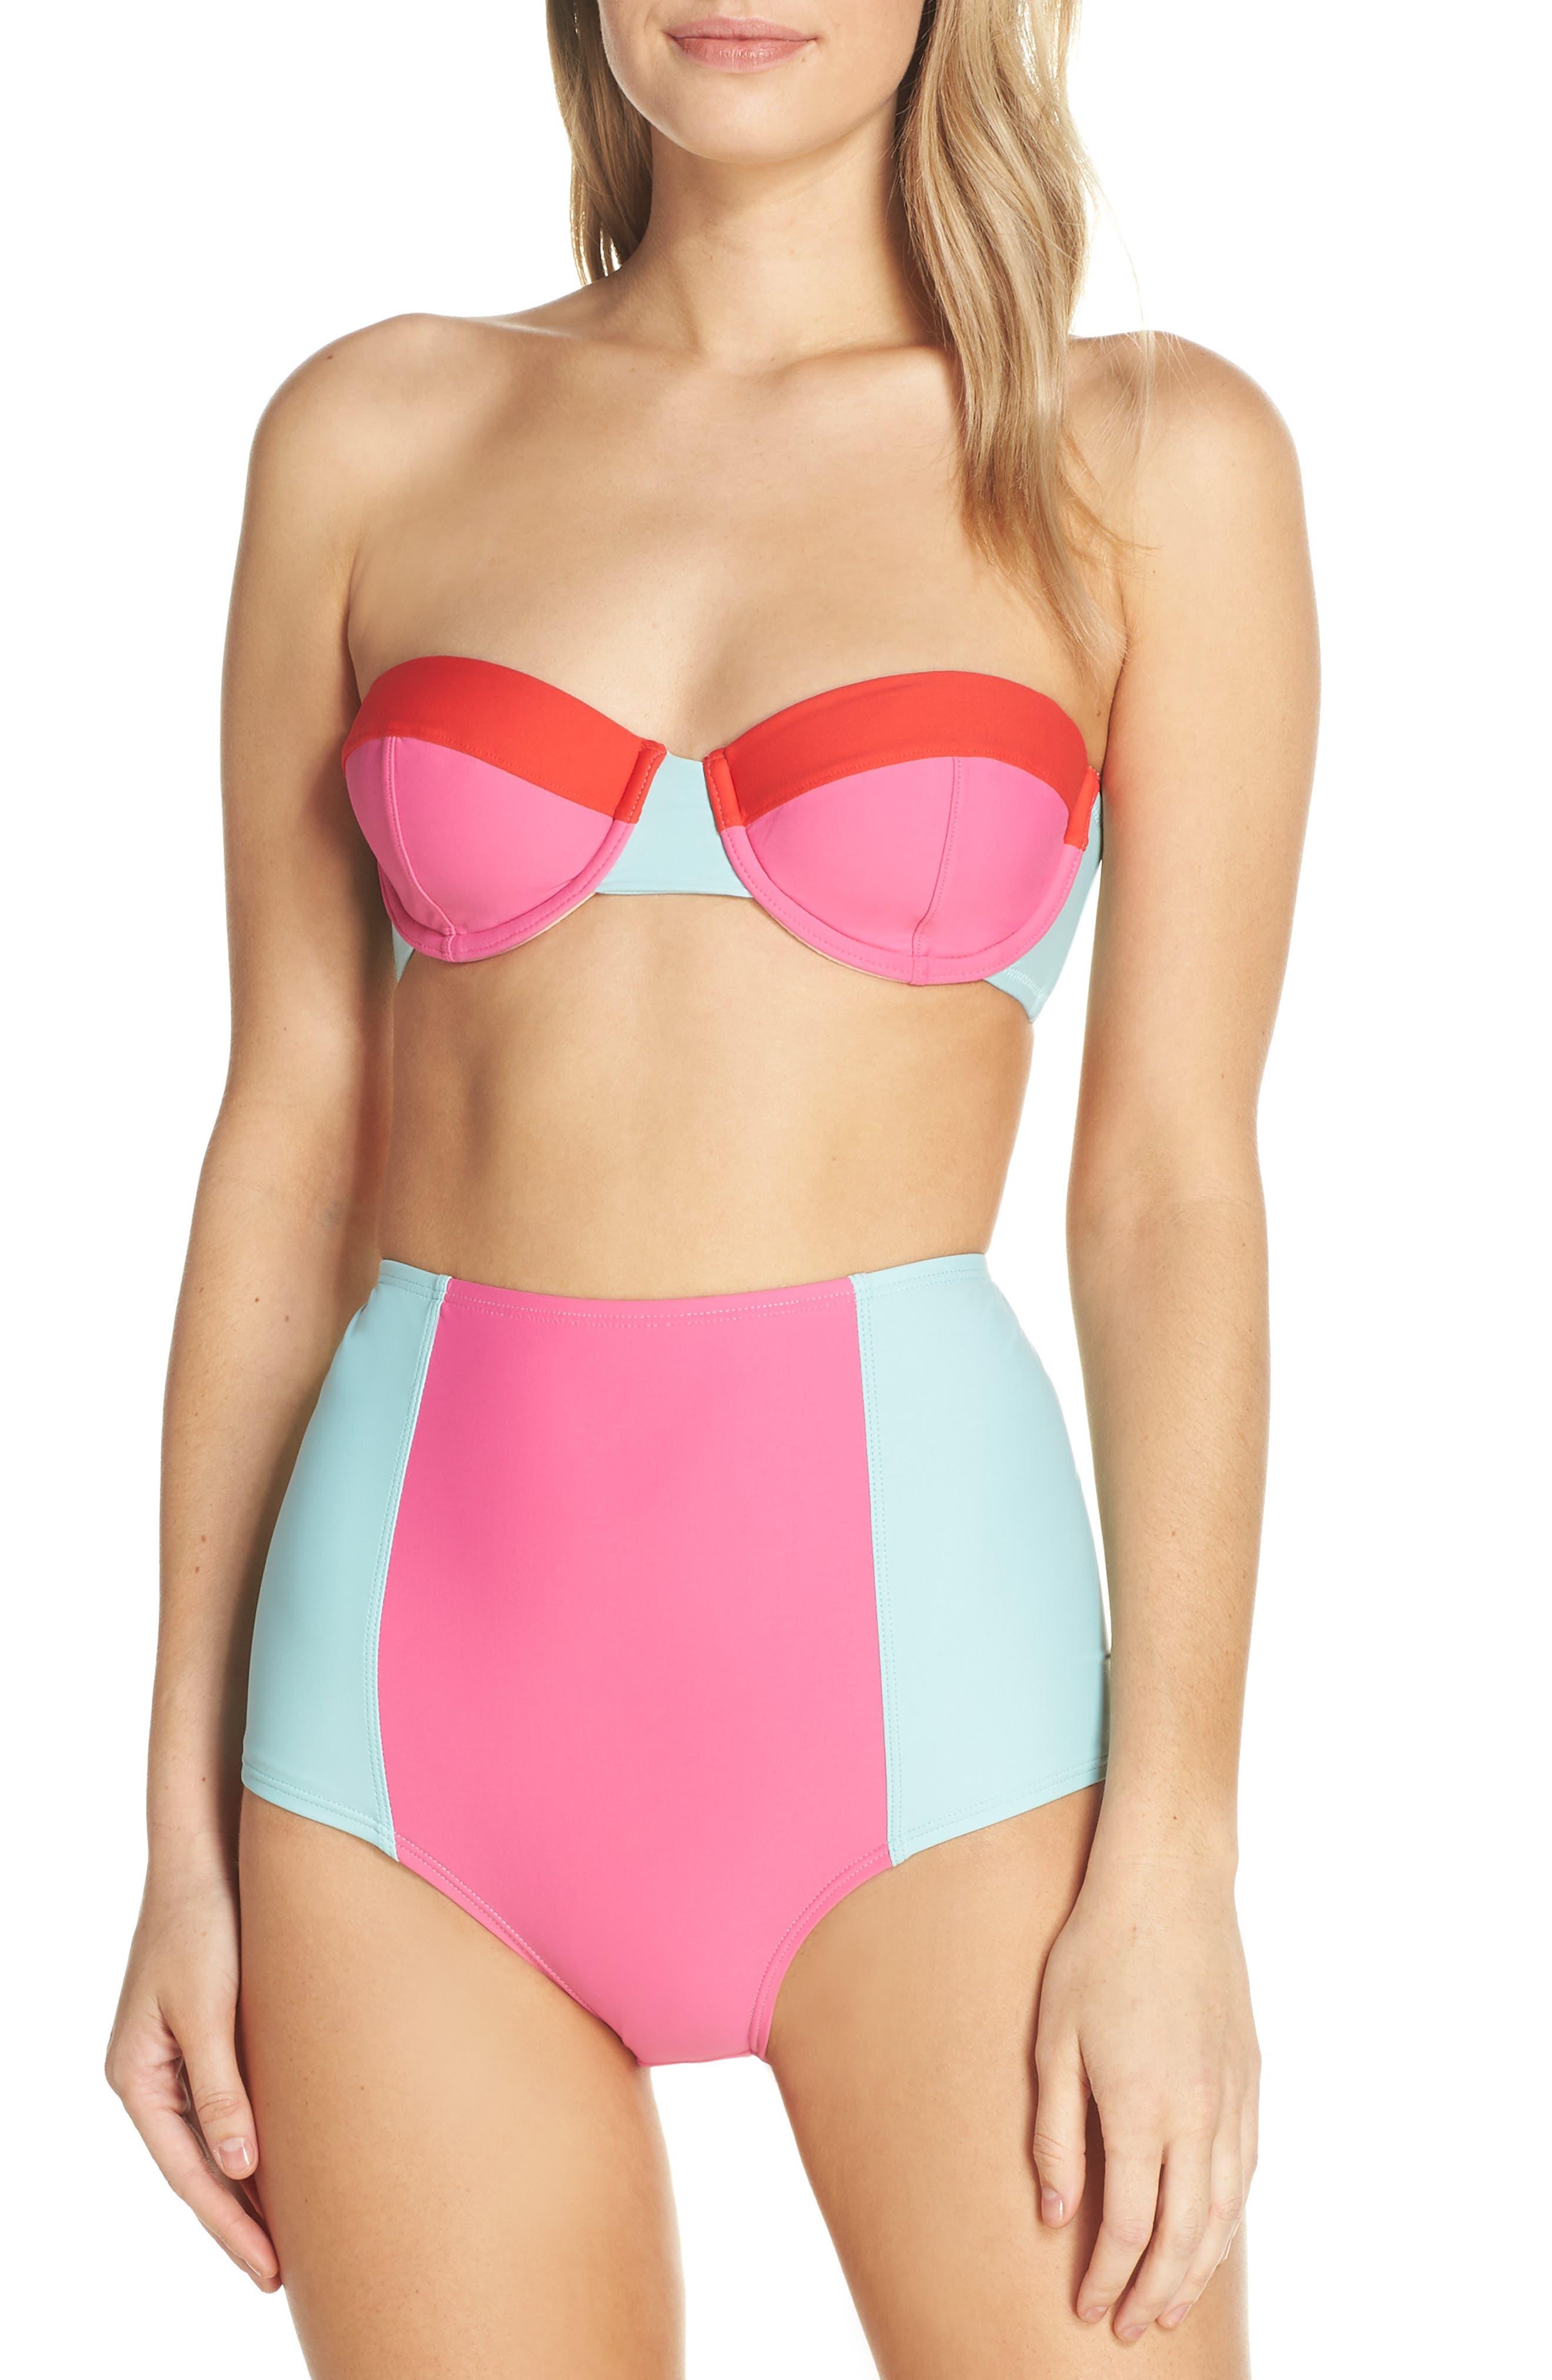 Colorblock Underwire Bikini Top,                             Alternate thumbnail 8, color,                             MINT CERISE PINK